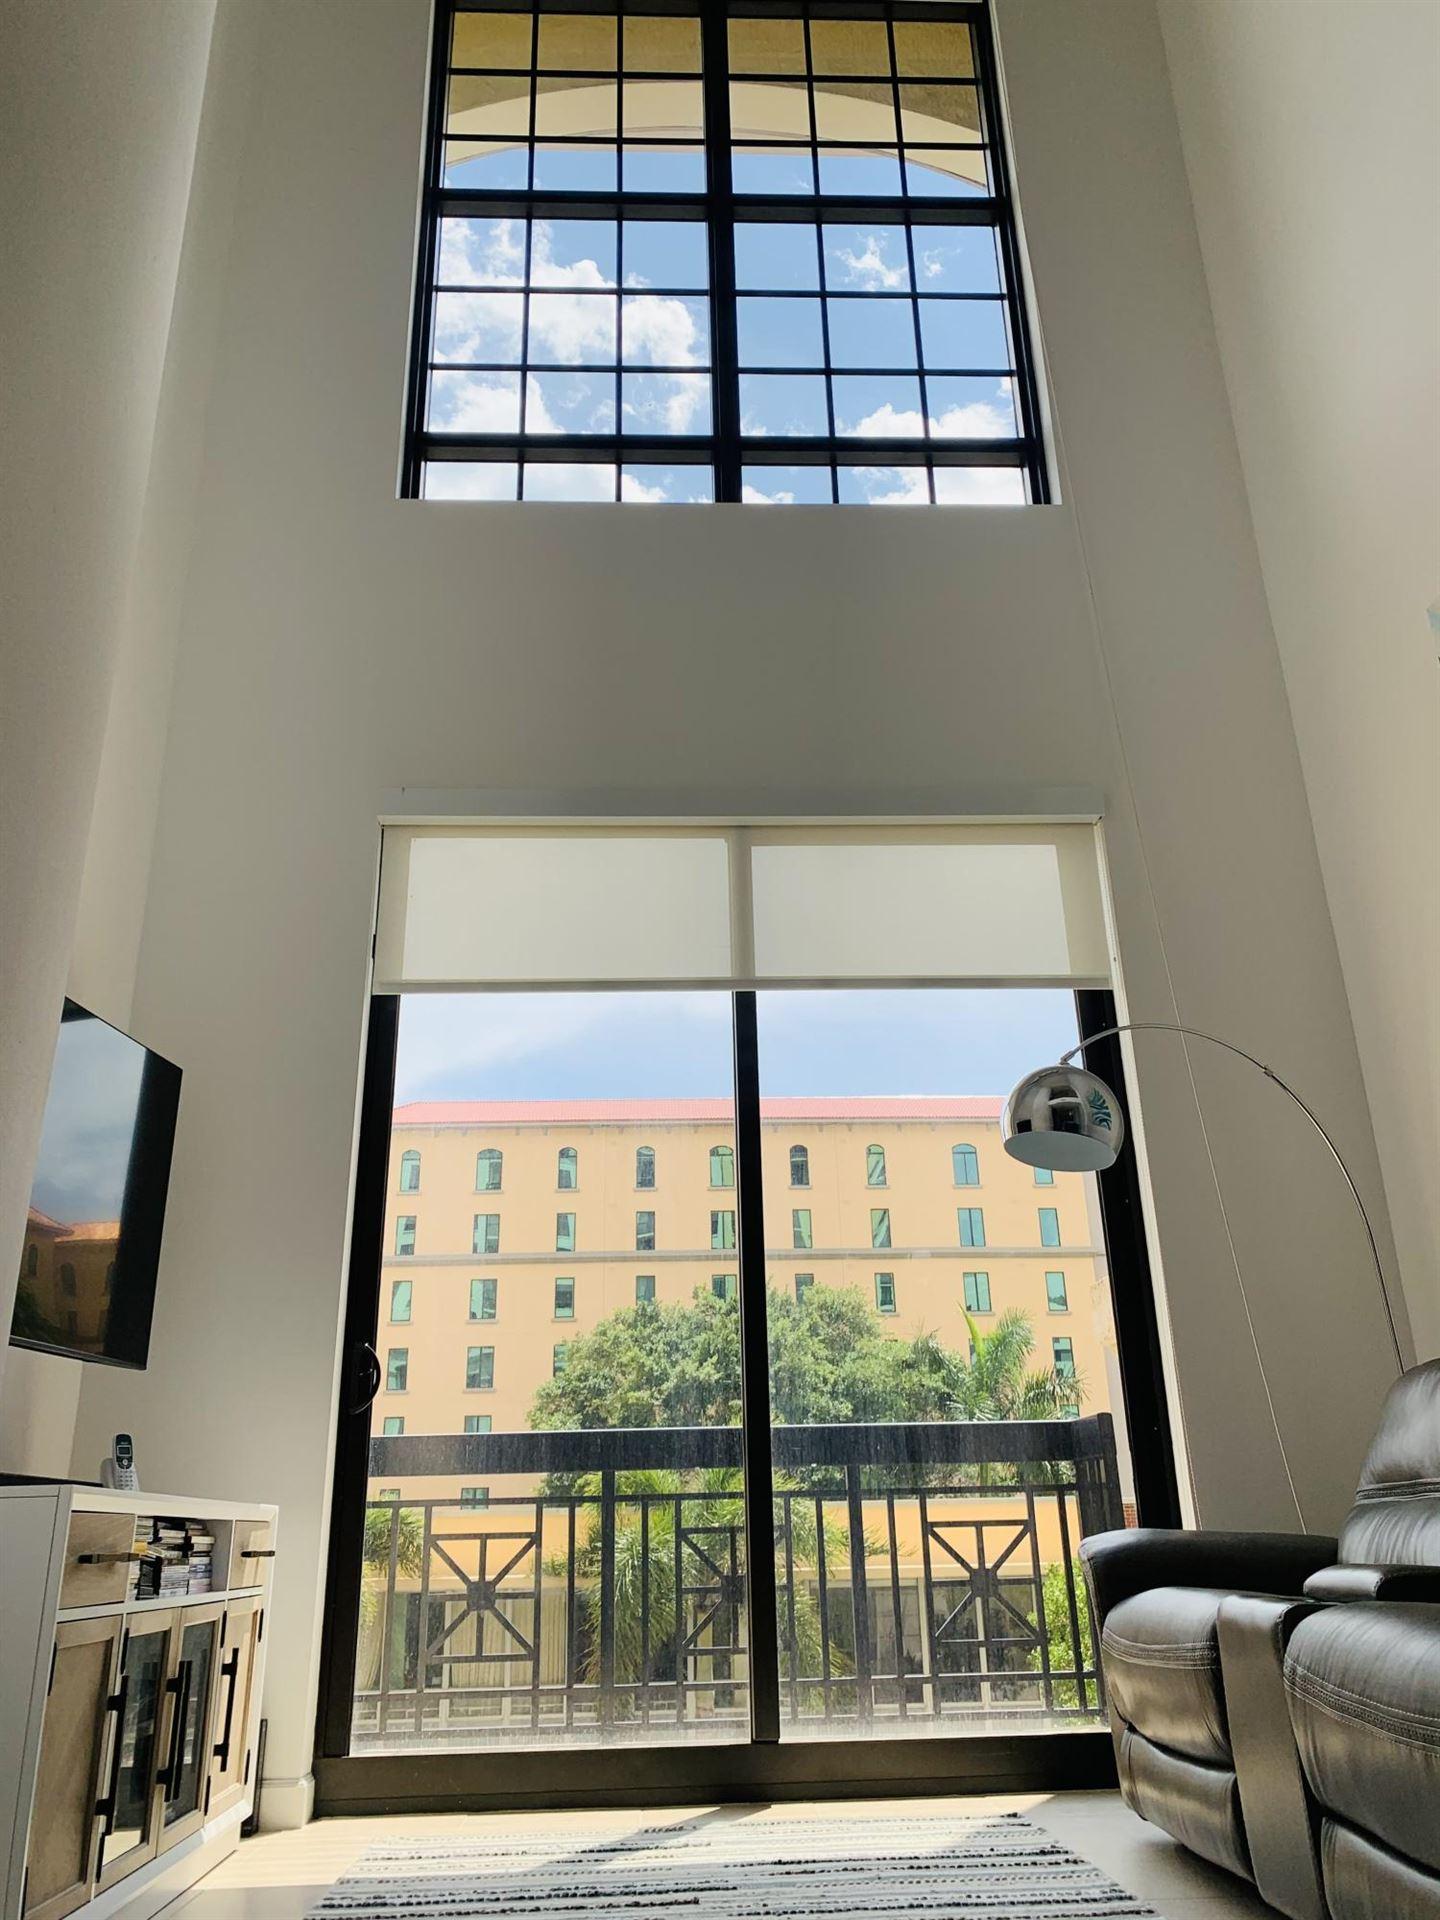 801 S Olive Avenue #204, West Palm Beach, FL 33401 - MLS#: RX-10700412